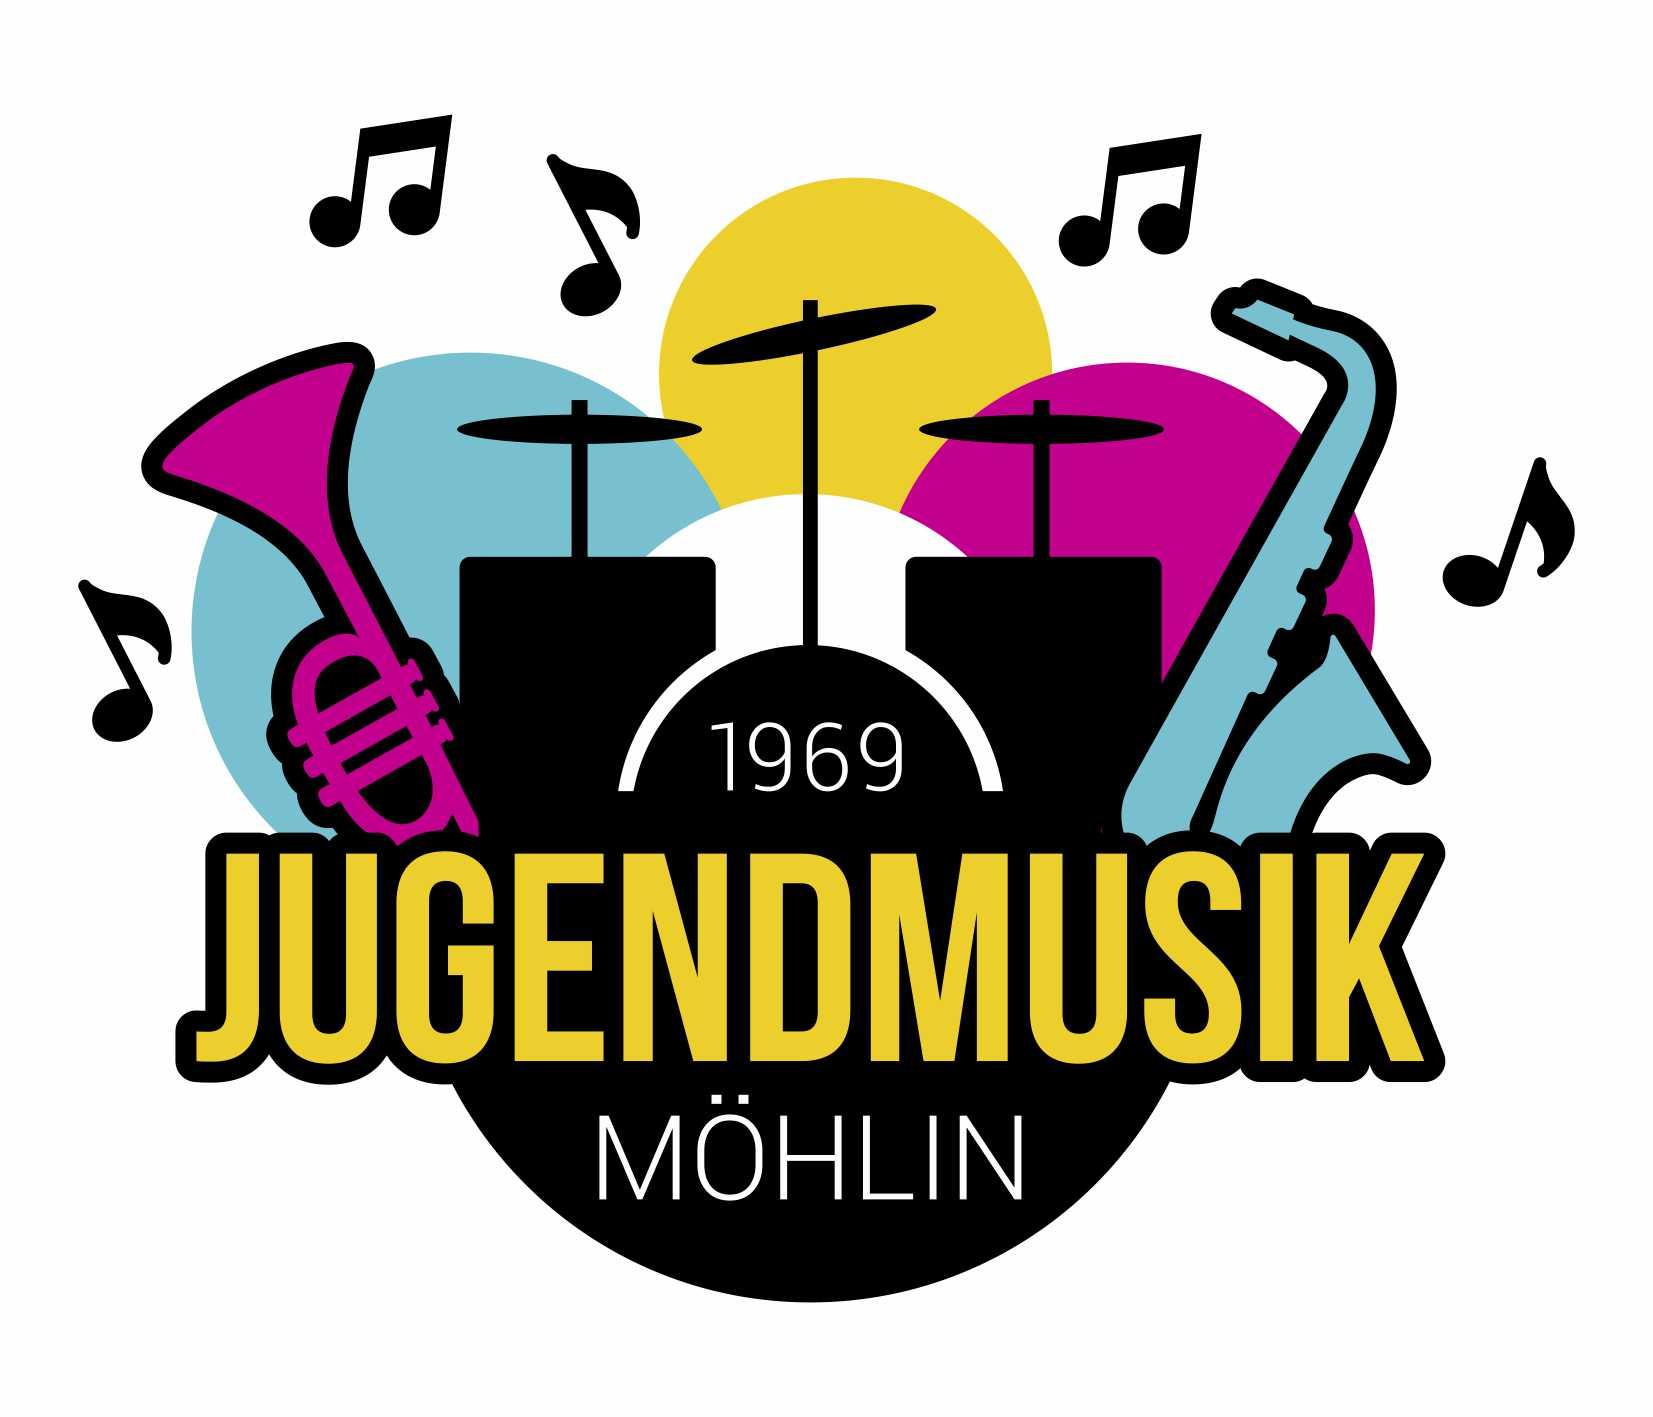 Jugendmusik Möhlin